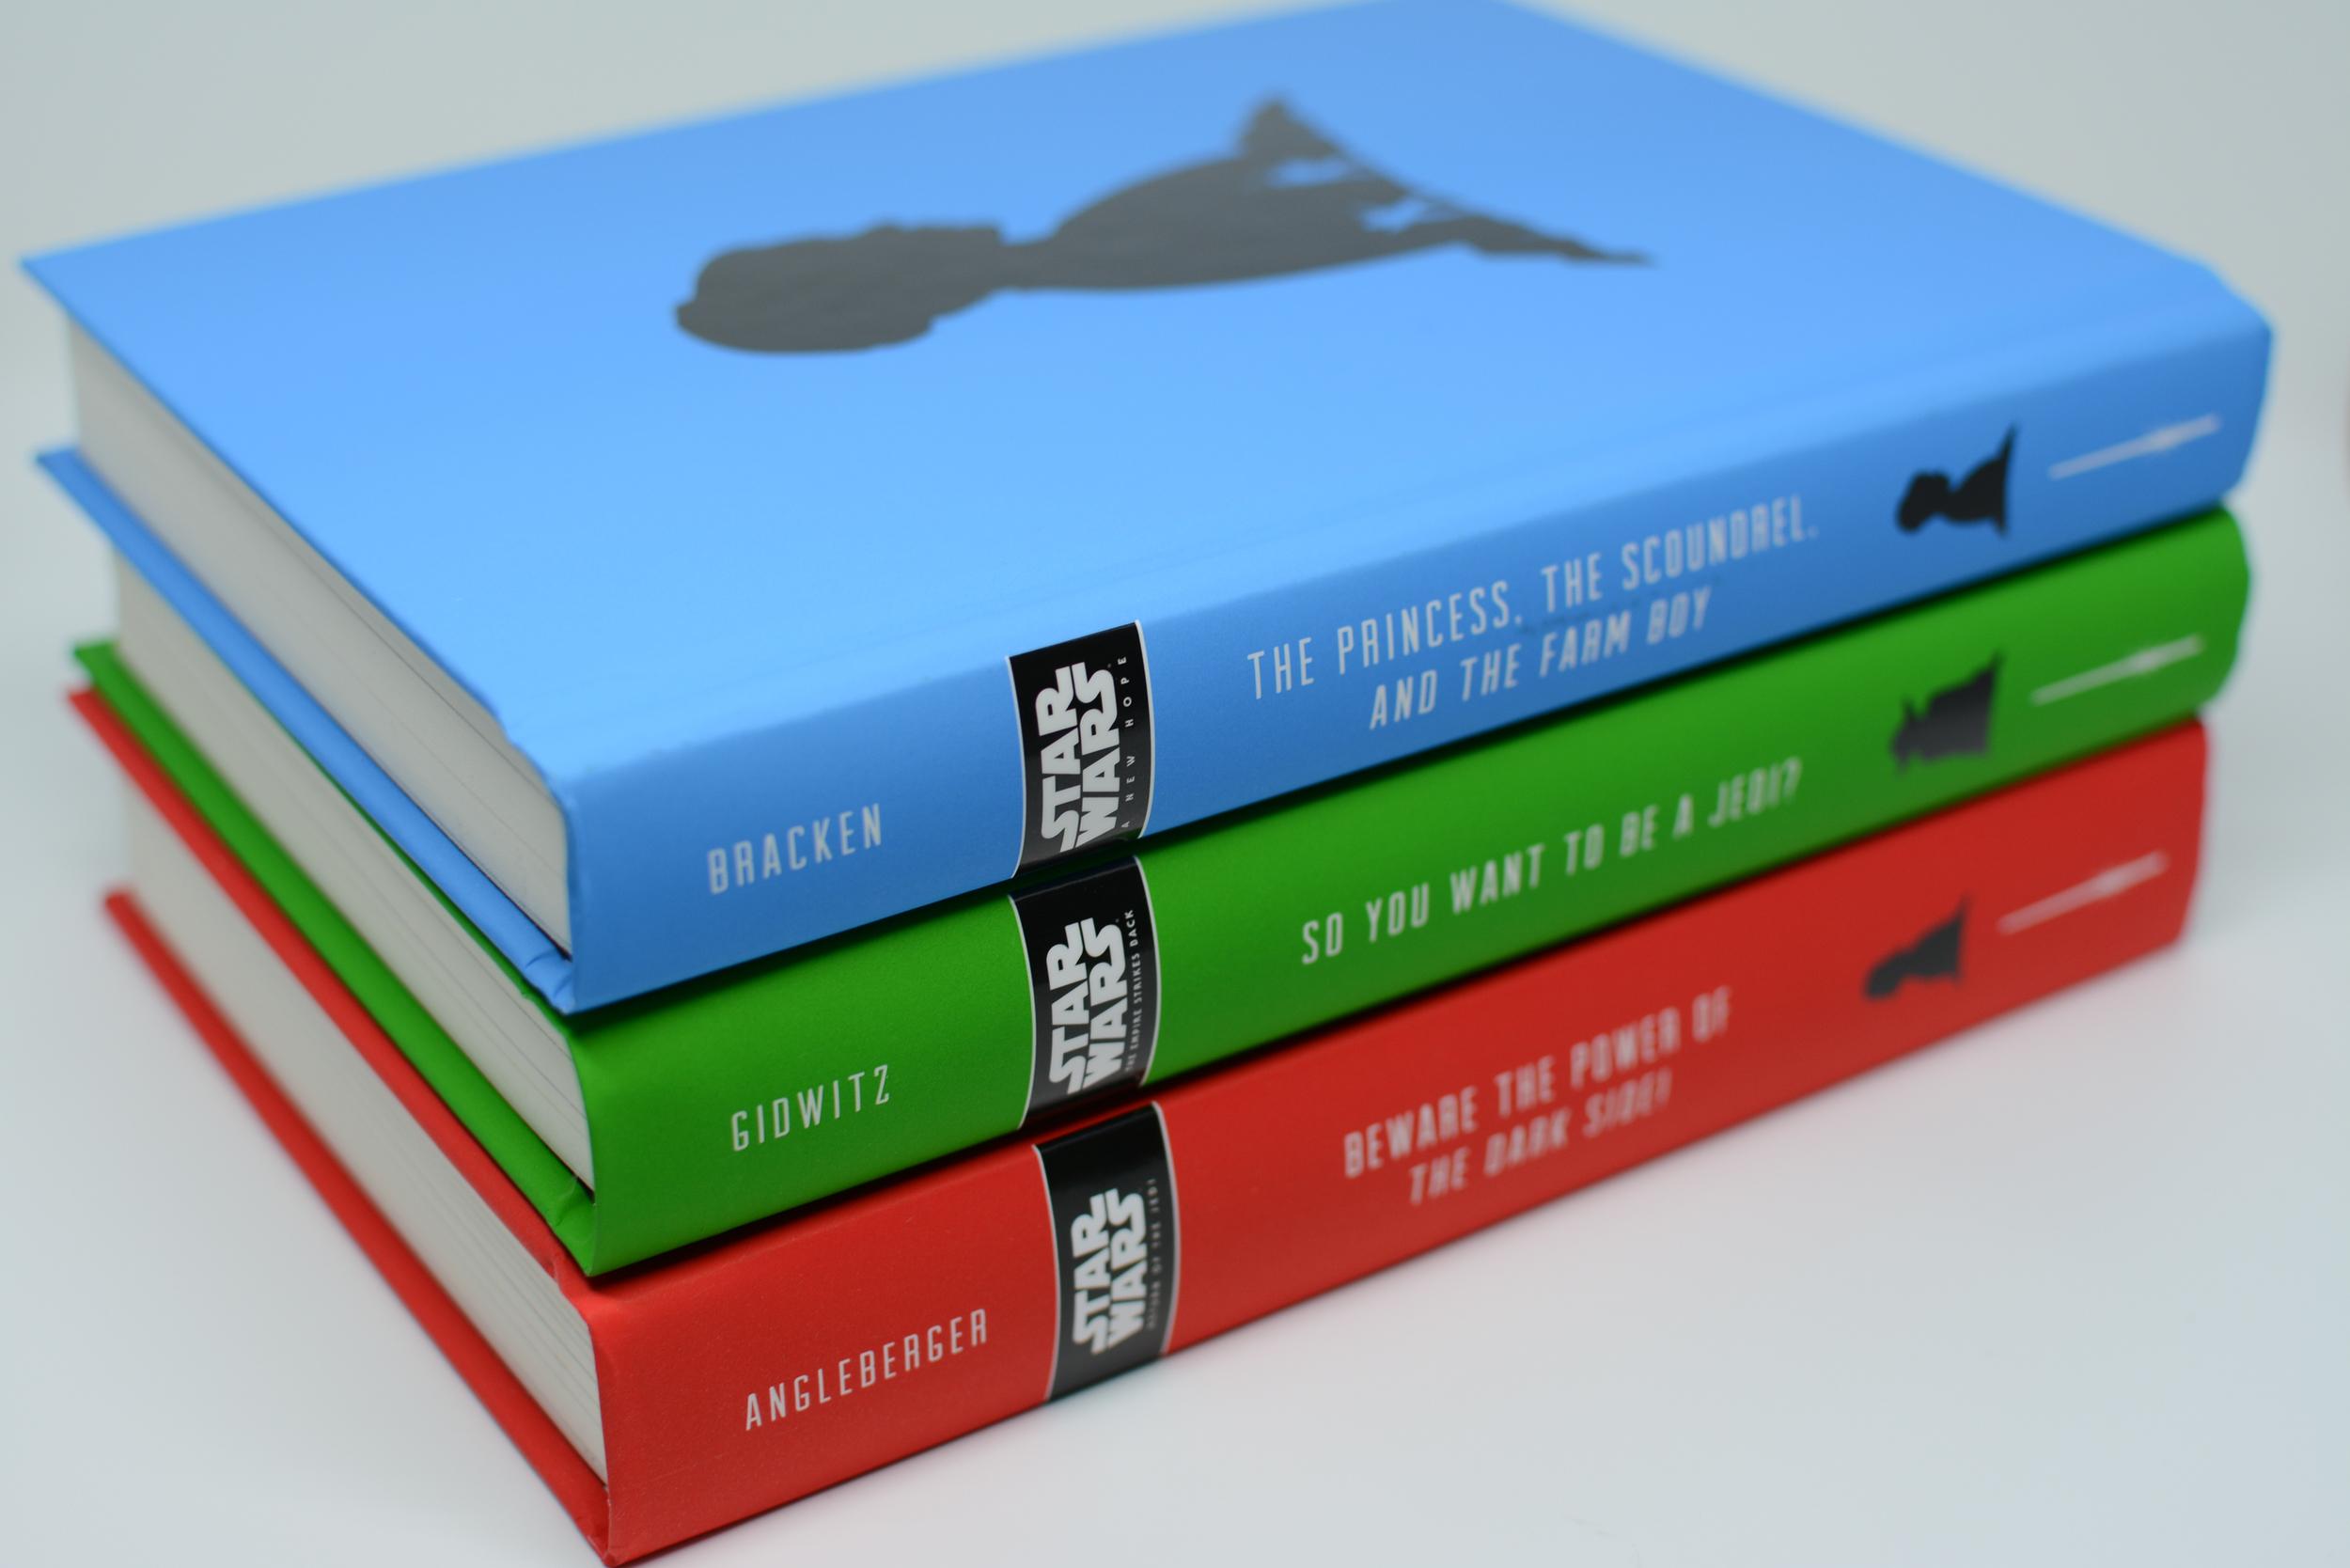 Pam Portfolio Starwars Books-53.jpg